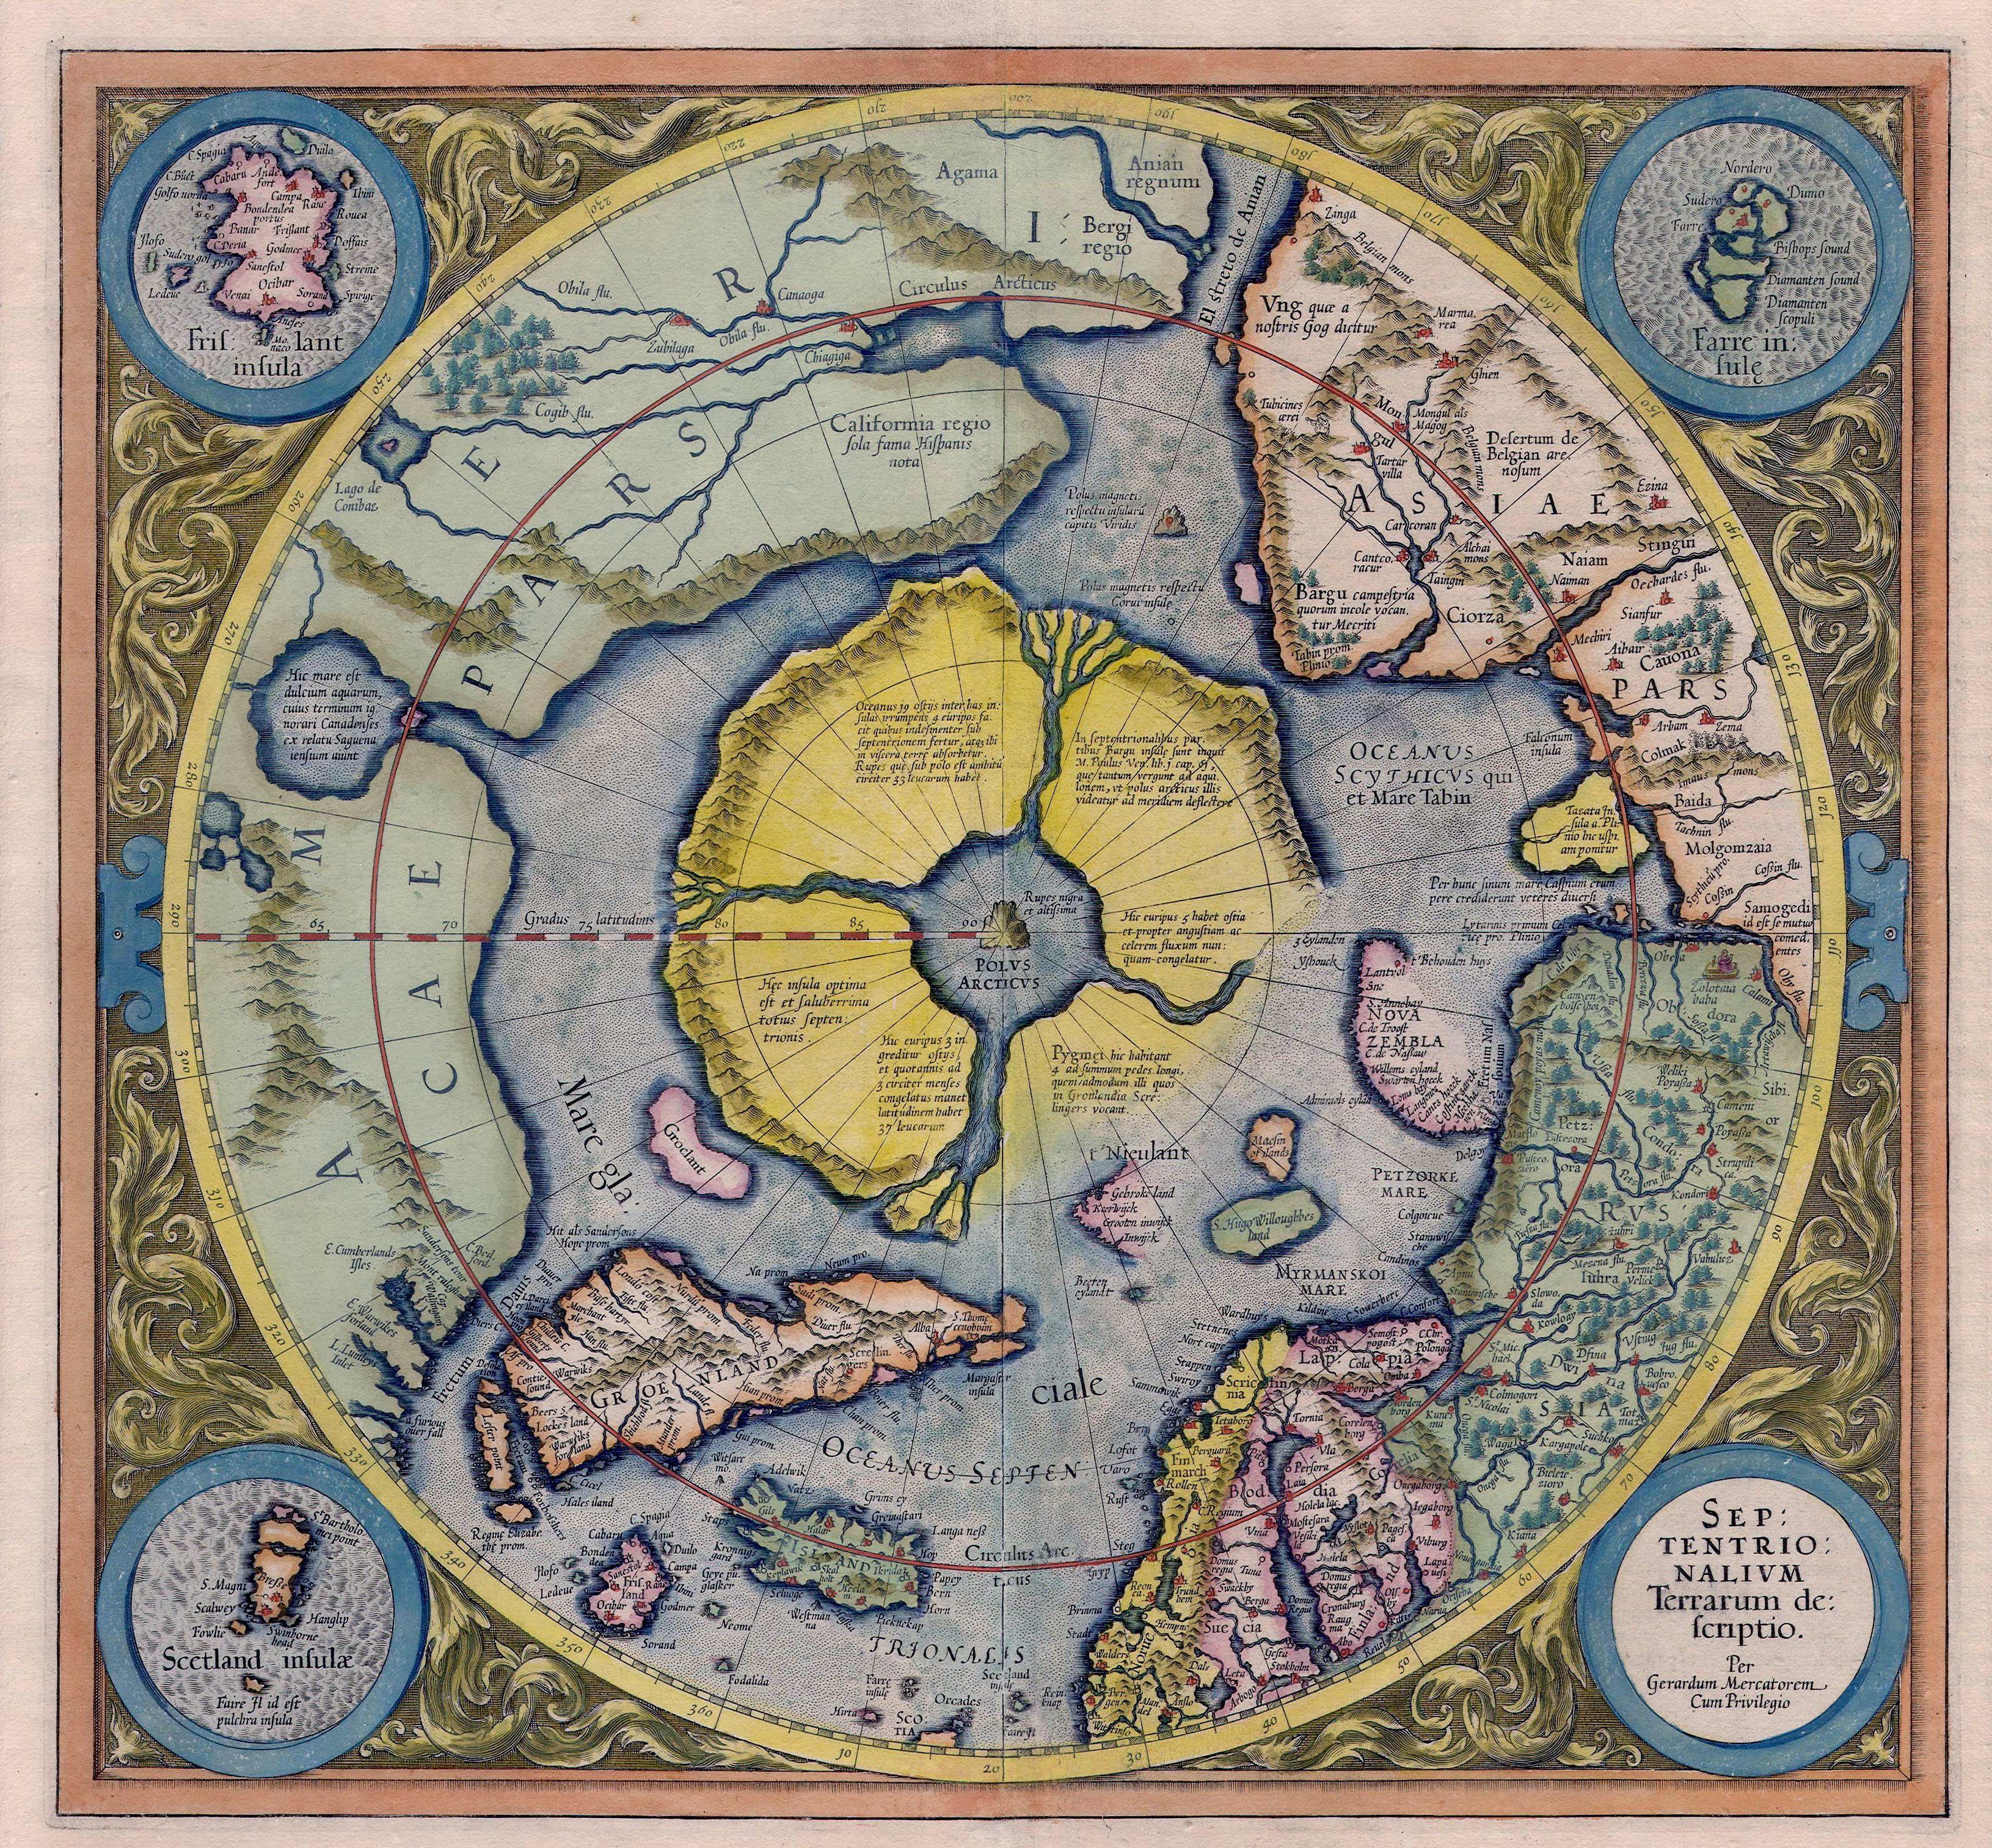 The arctic circle httpuploadmediawikipediacommons5 the arctic circle httpuploadmediawikipediacommons556mercatorseptentrionaliumterrarumdescriptiog gumiabroncs Image collections